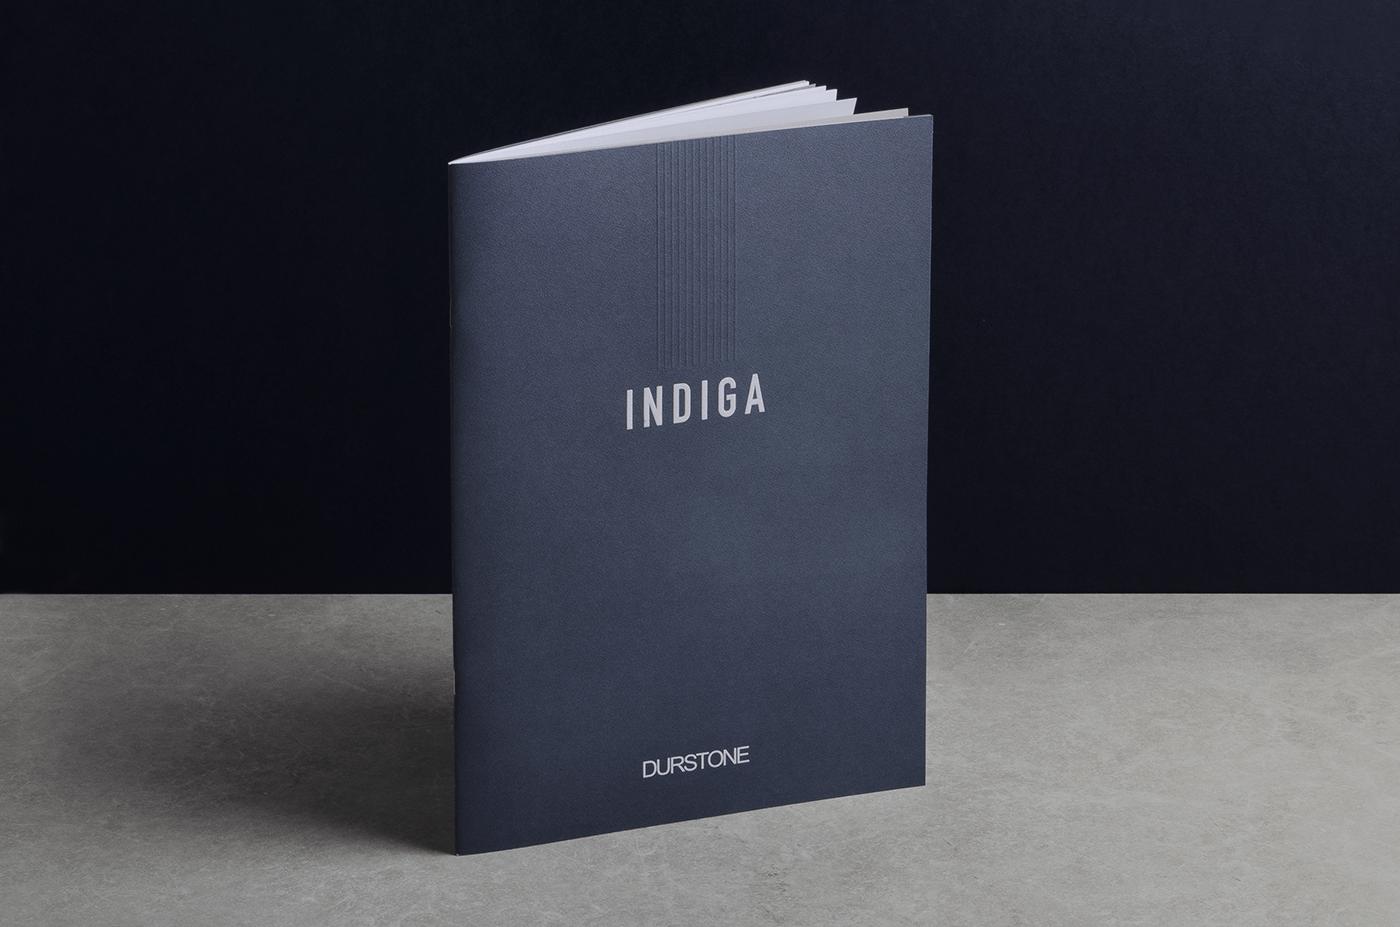 Catálogo Indiga 2019 - Durstone